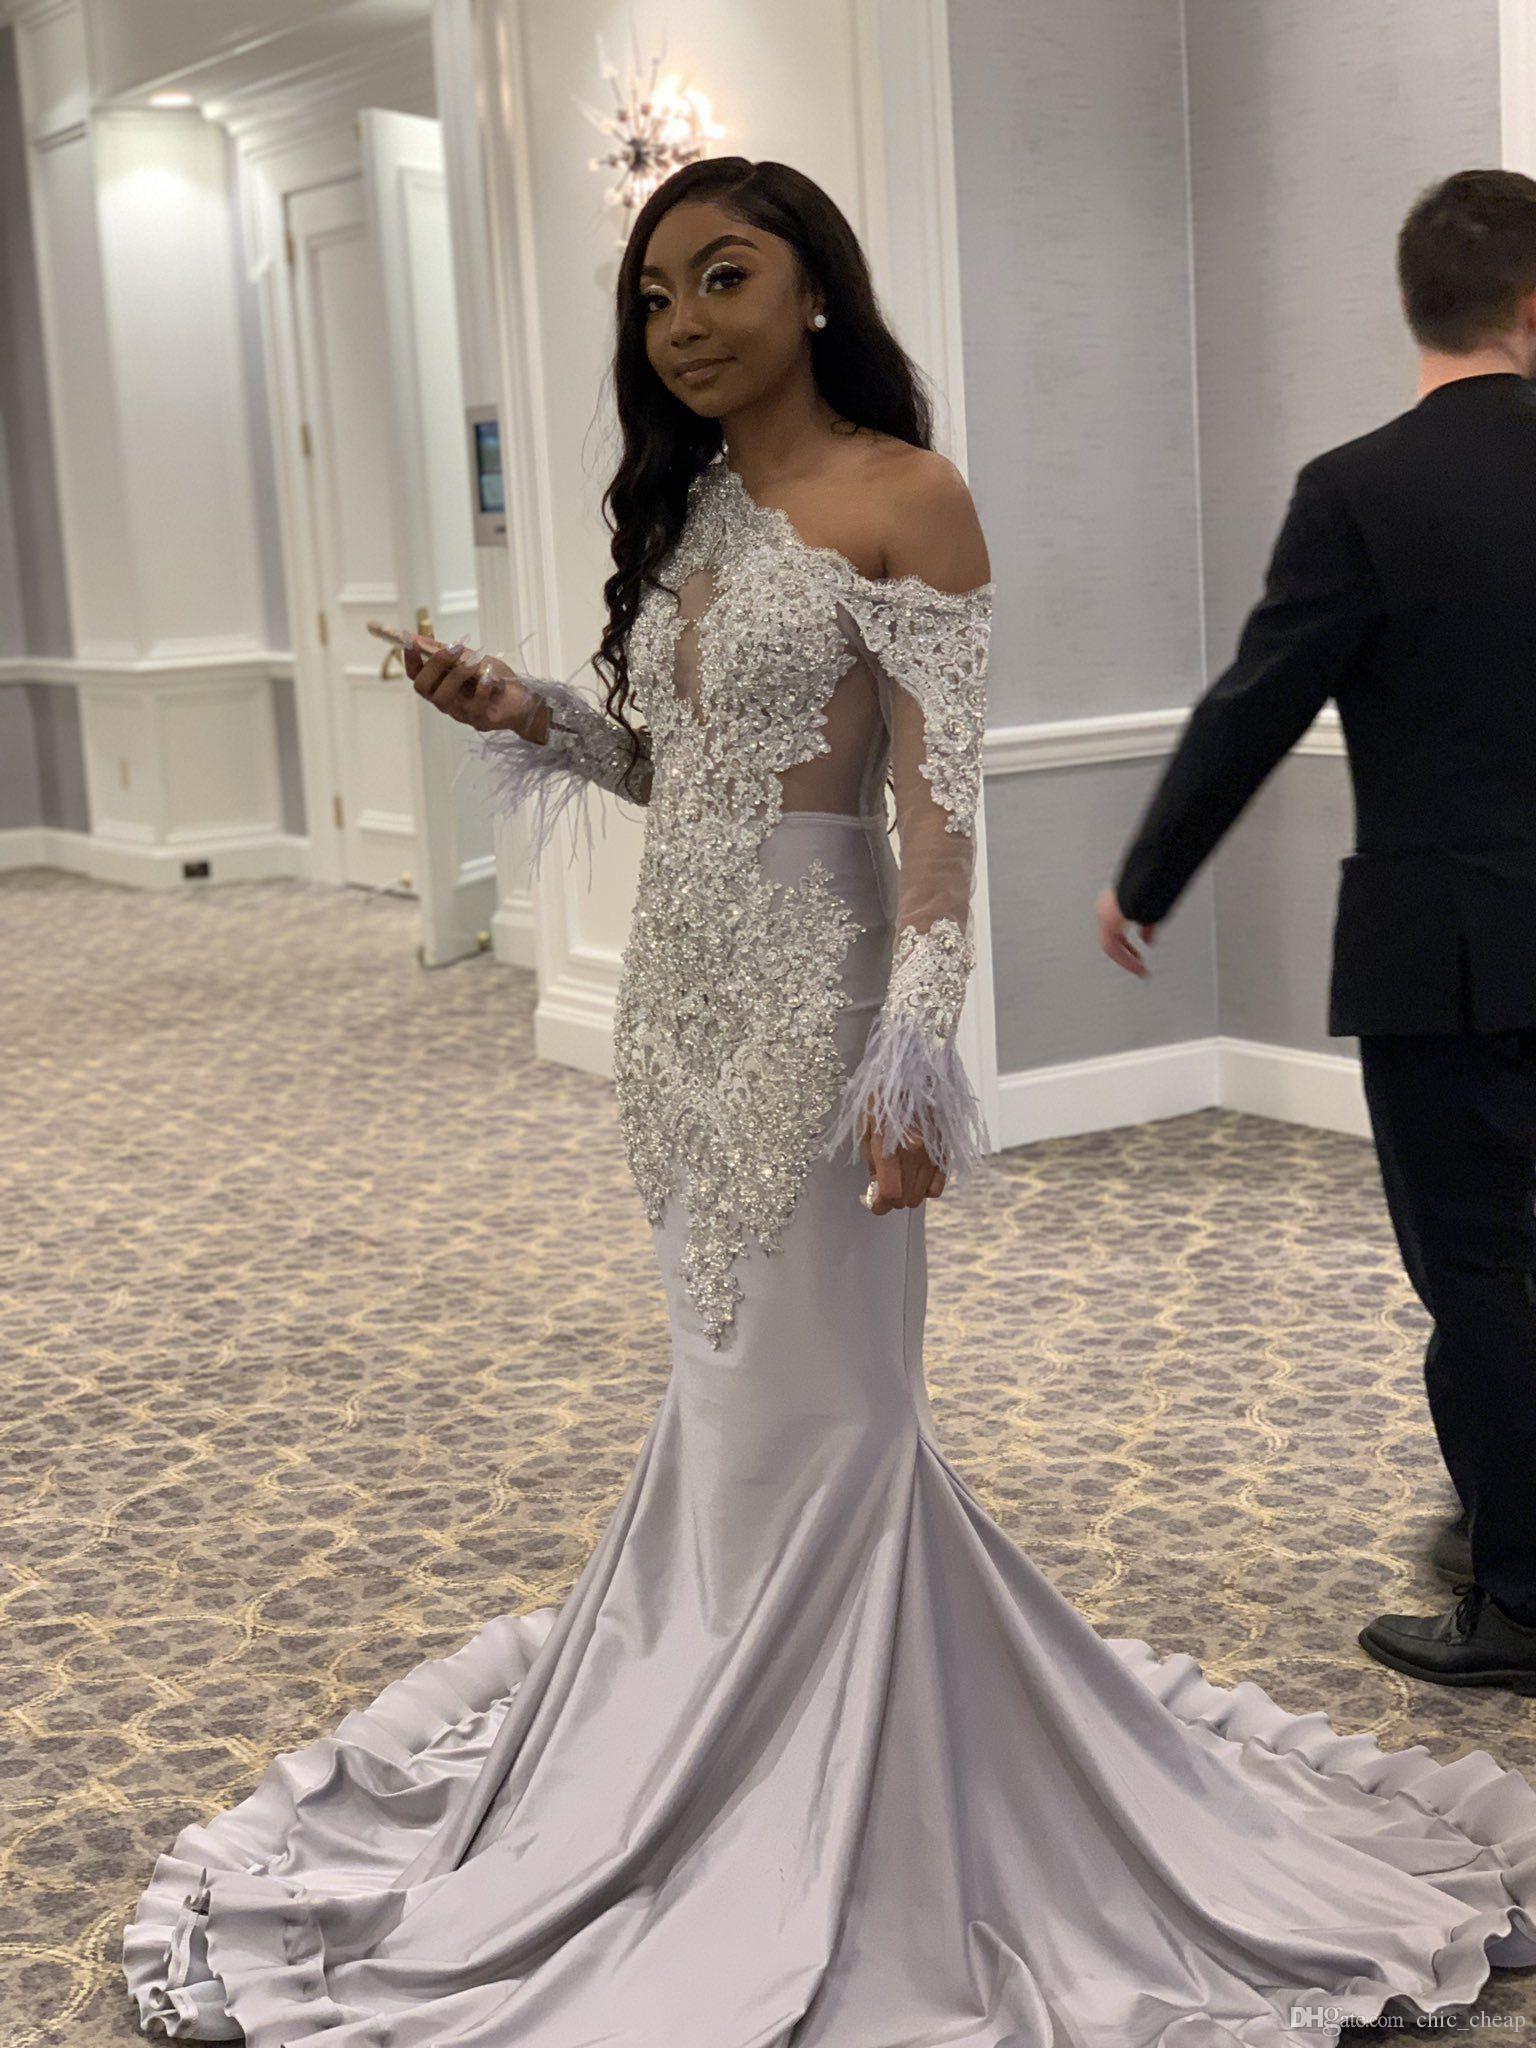 Silver Beaded Plus-Size Ballgown Wedding Dress - Essense